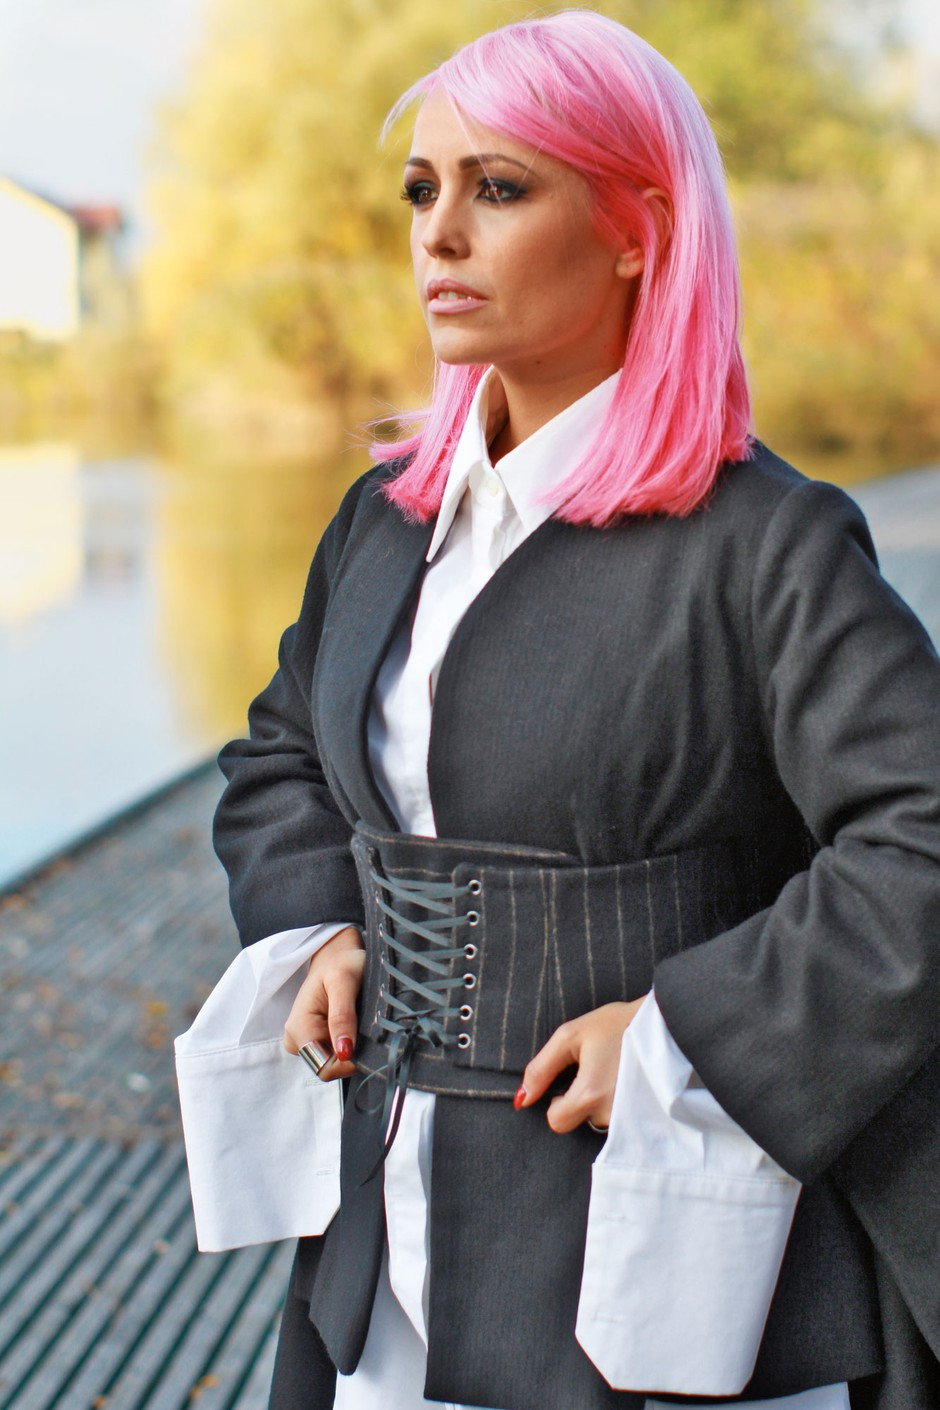 Nina Šušnjara iskreno o tem, kako fizično naporno je modno poslanstvo (foto: Goran Antley)